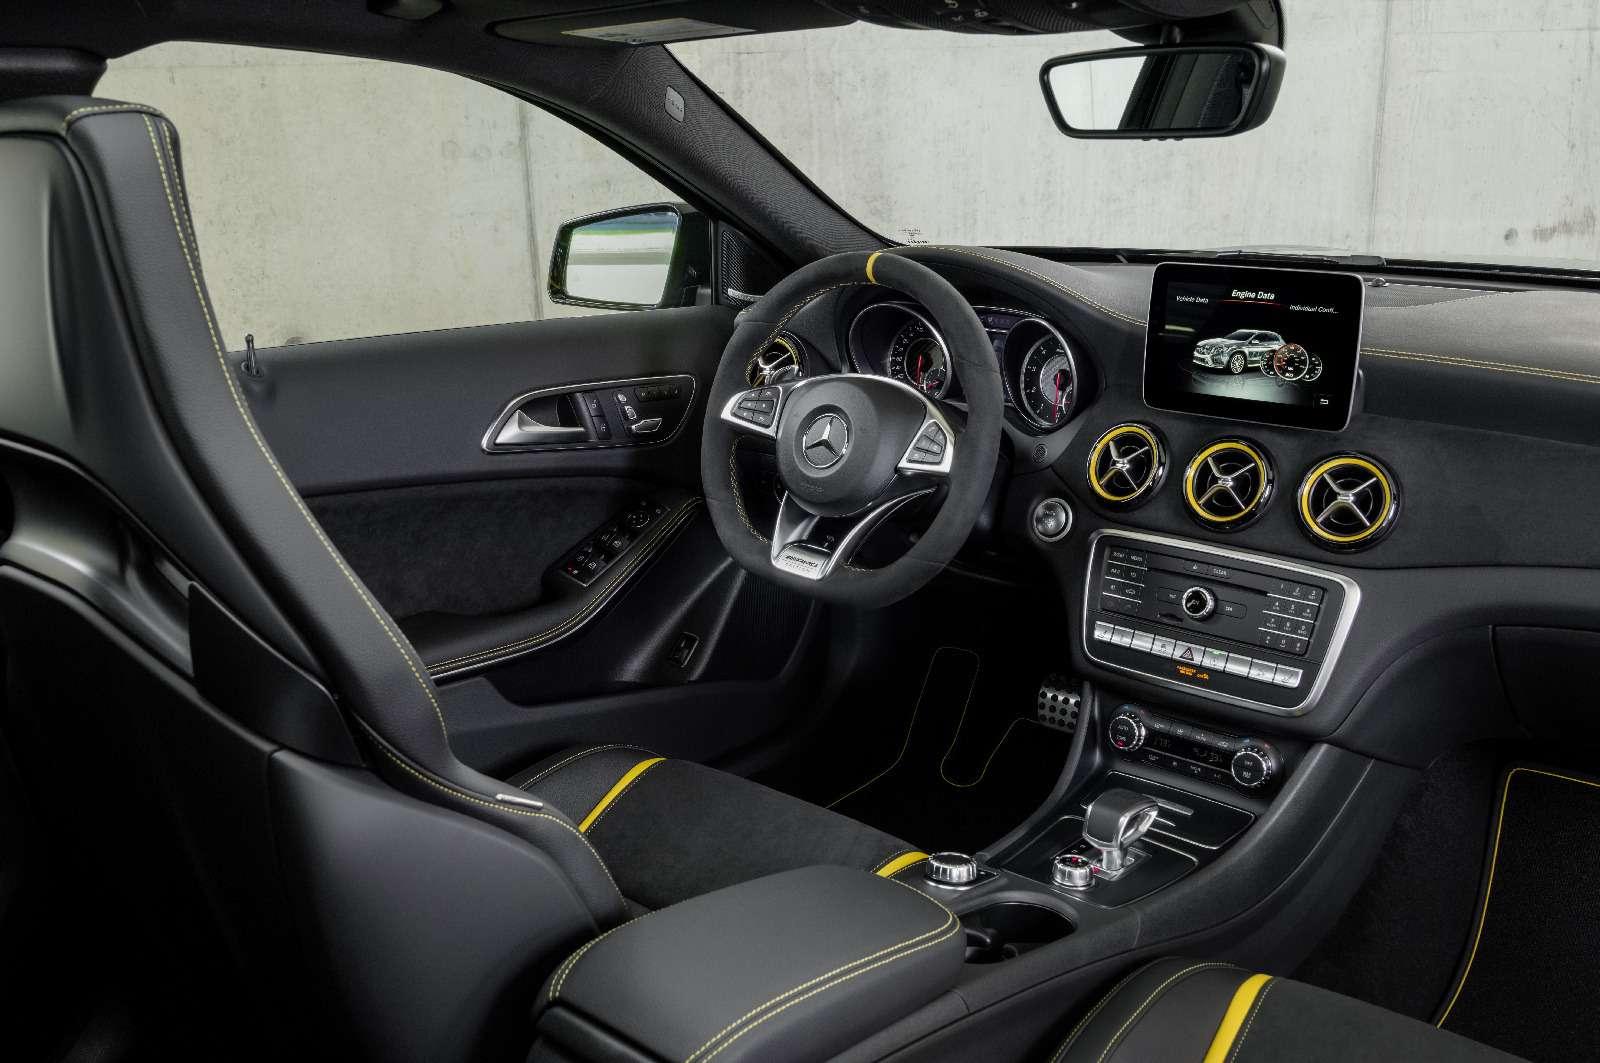 Mercedes-Benz GLA стал краше, нонепросторнее— фото 690085